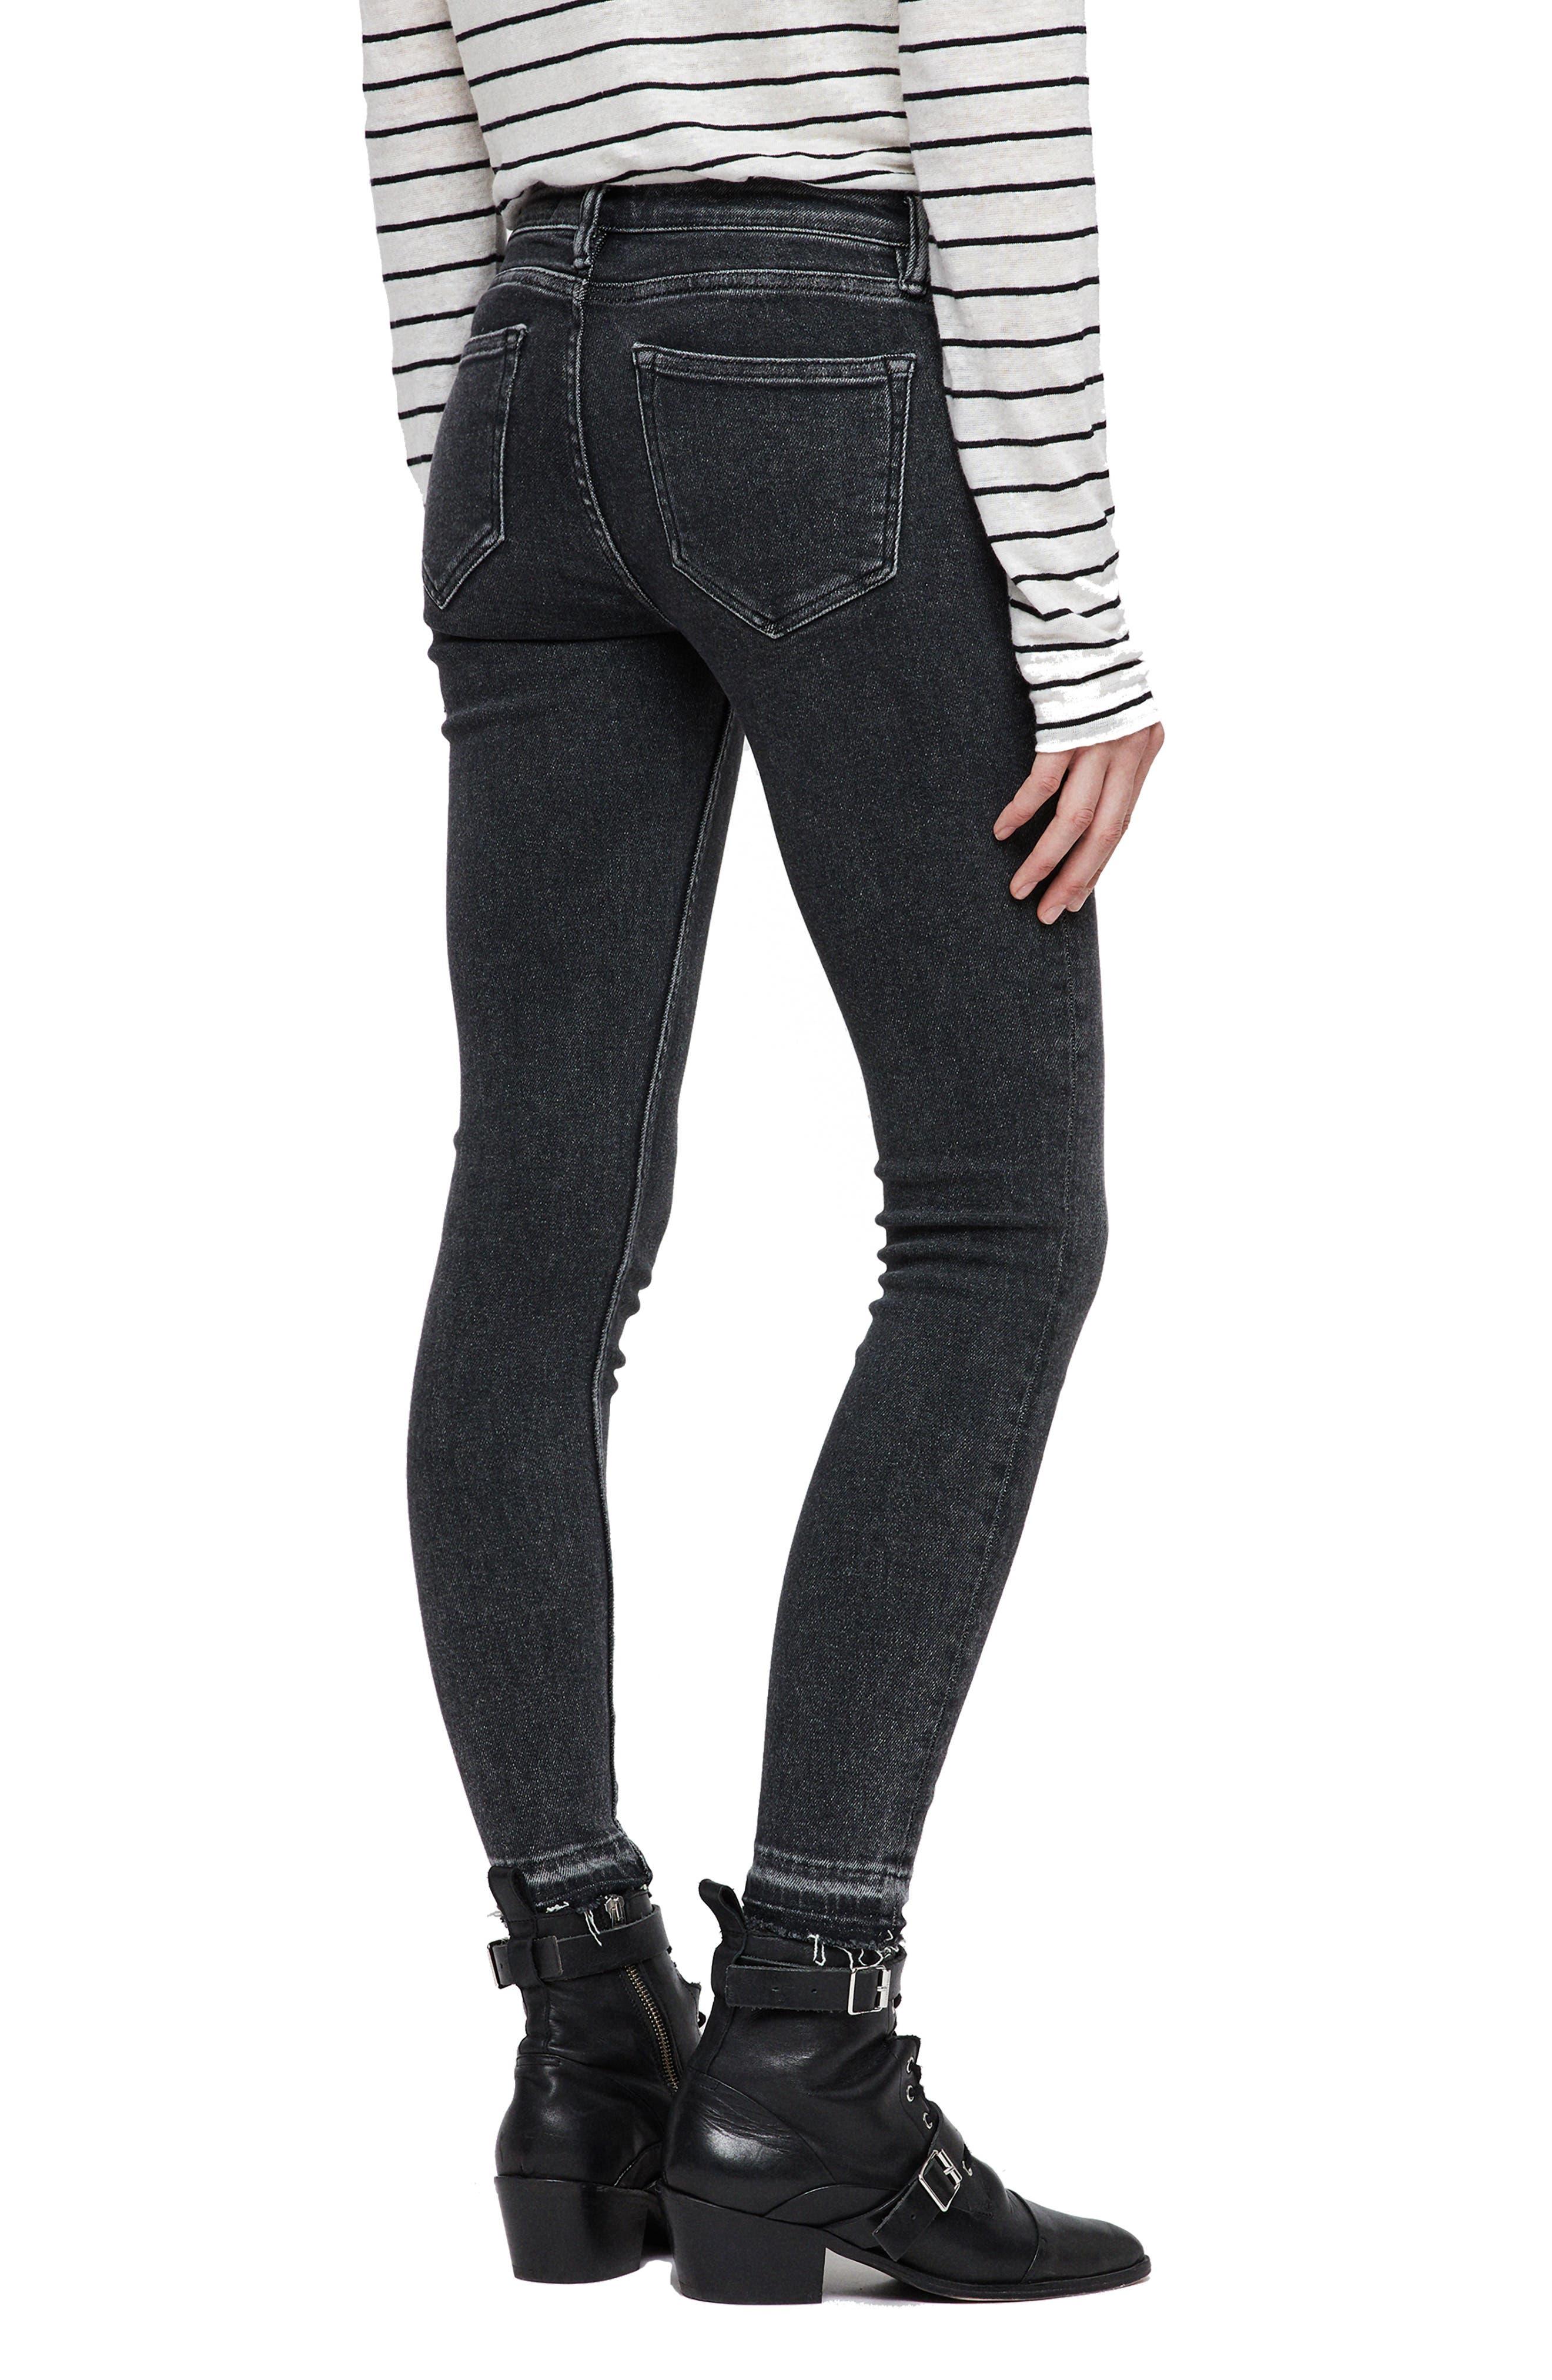 Mast Ankle Skinny Jeans,                             Alternate thumbnail 3, color,                             WASHED BLACK